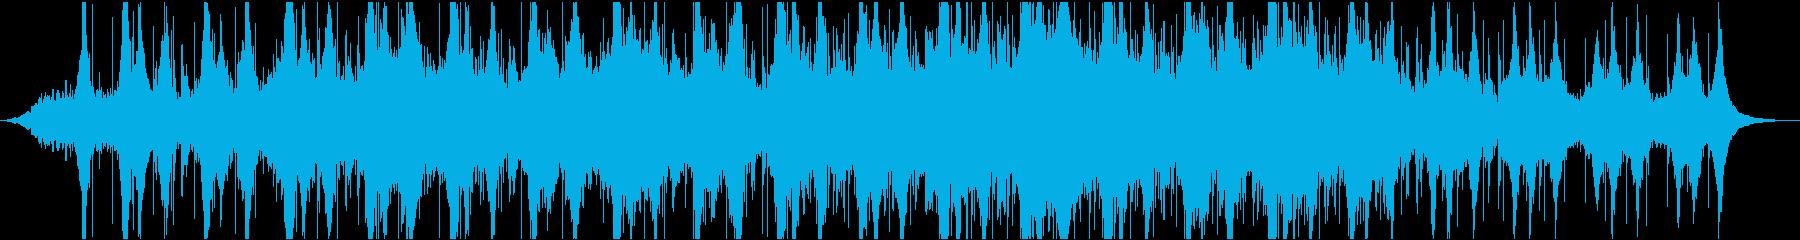 Atmosphericの再生済みの波形